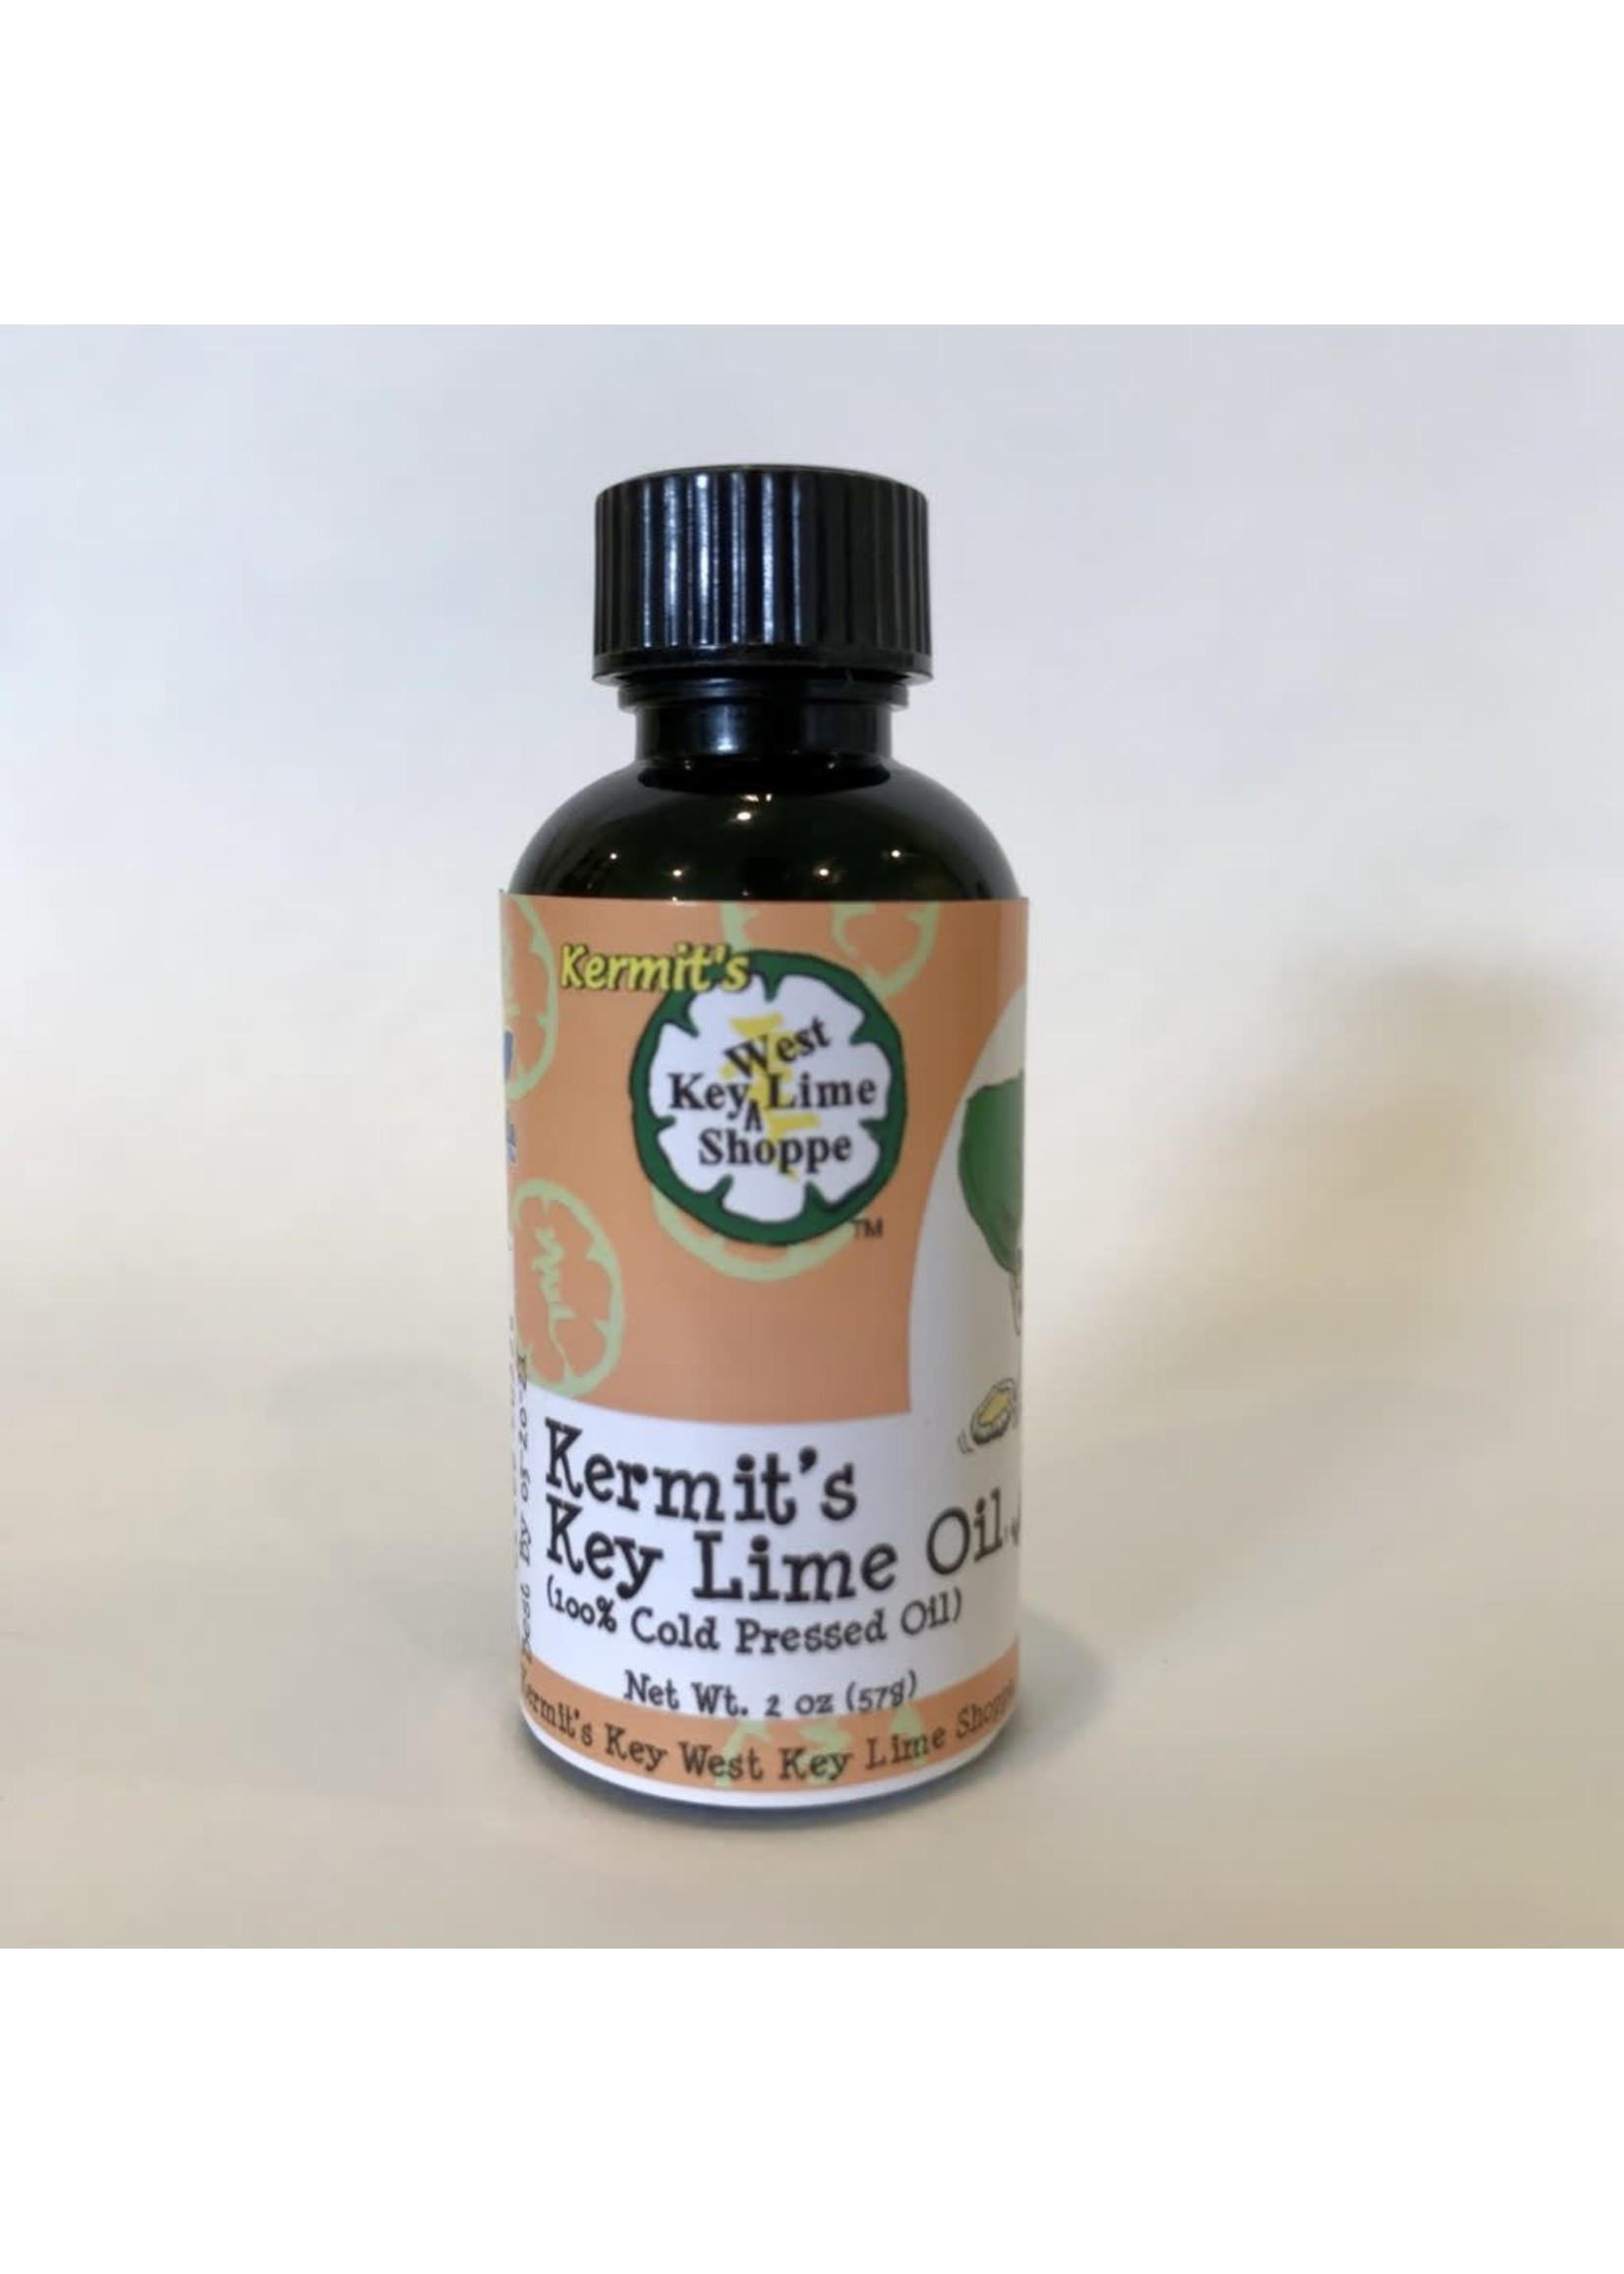 Kermit's Pure Key Lime Oil - 2oz